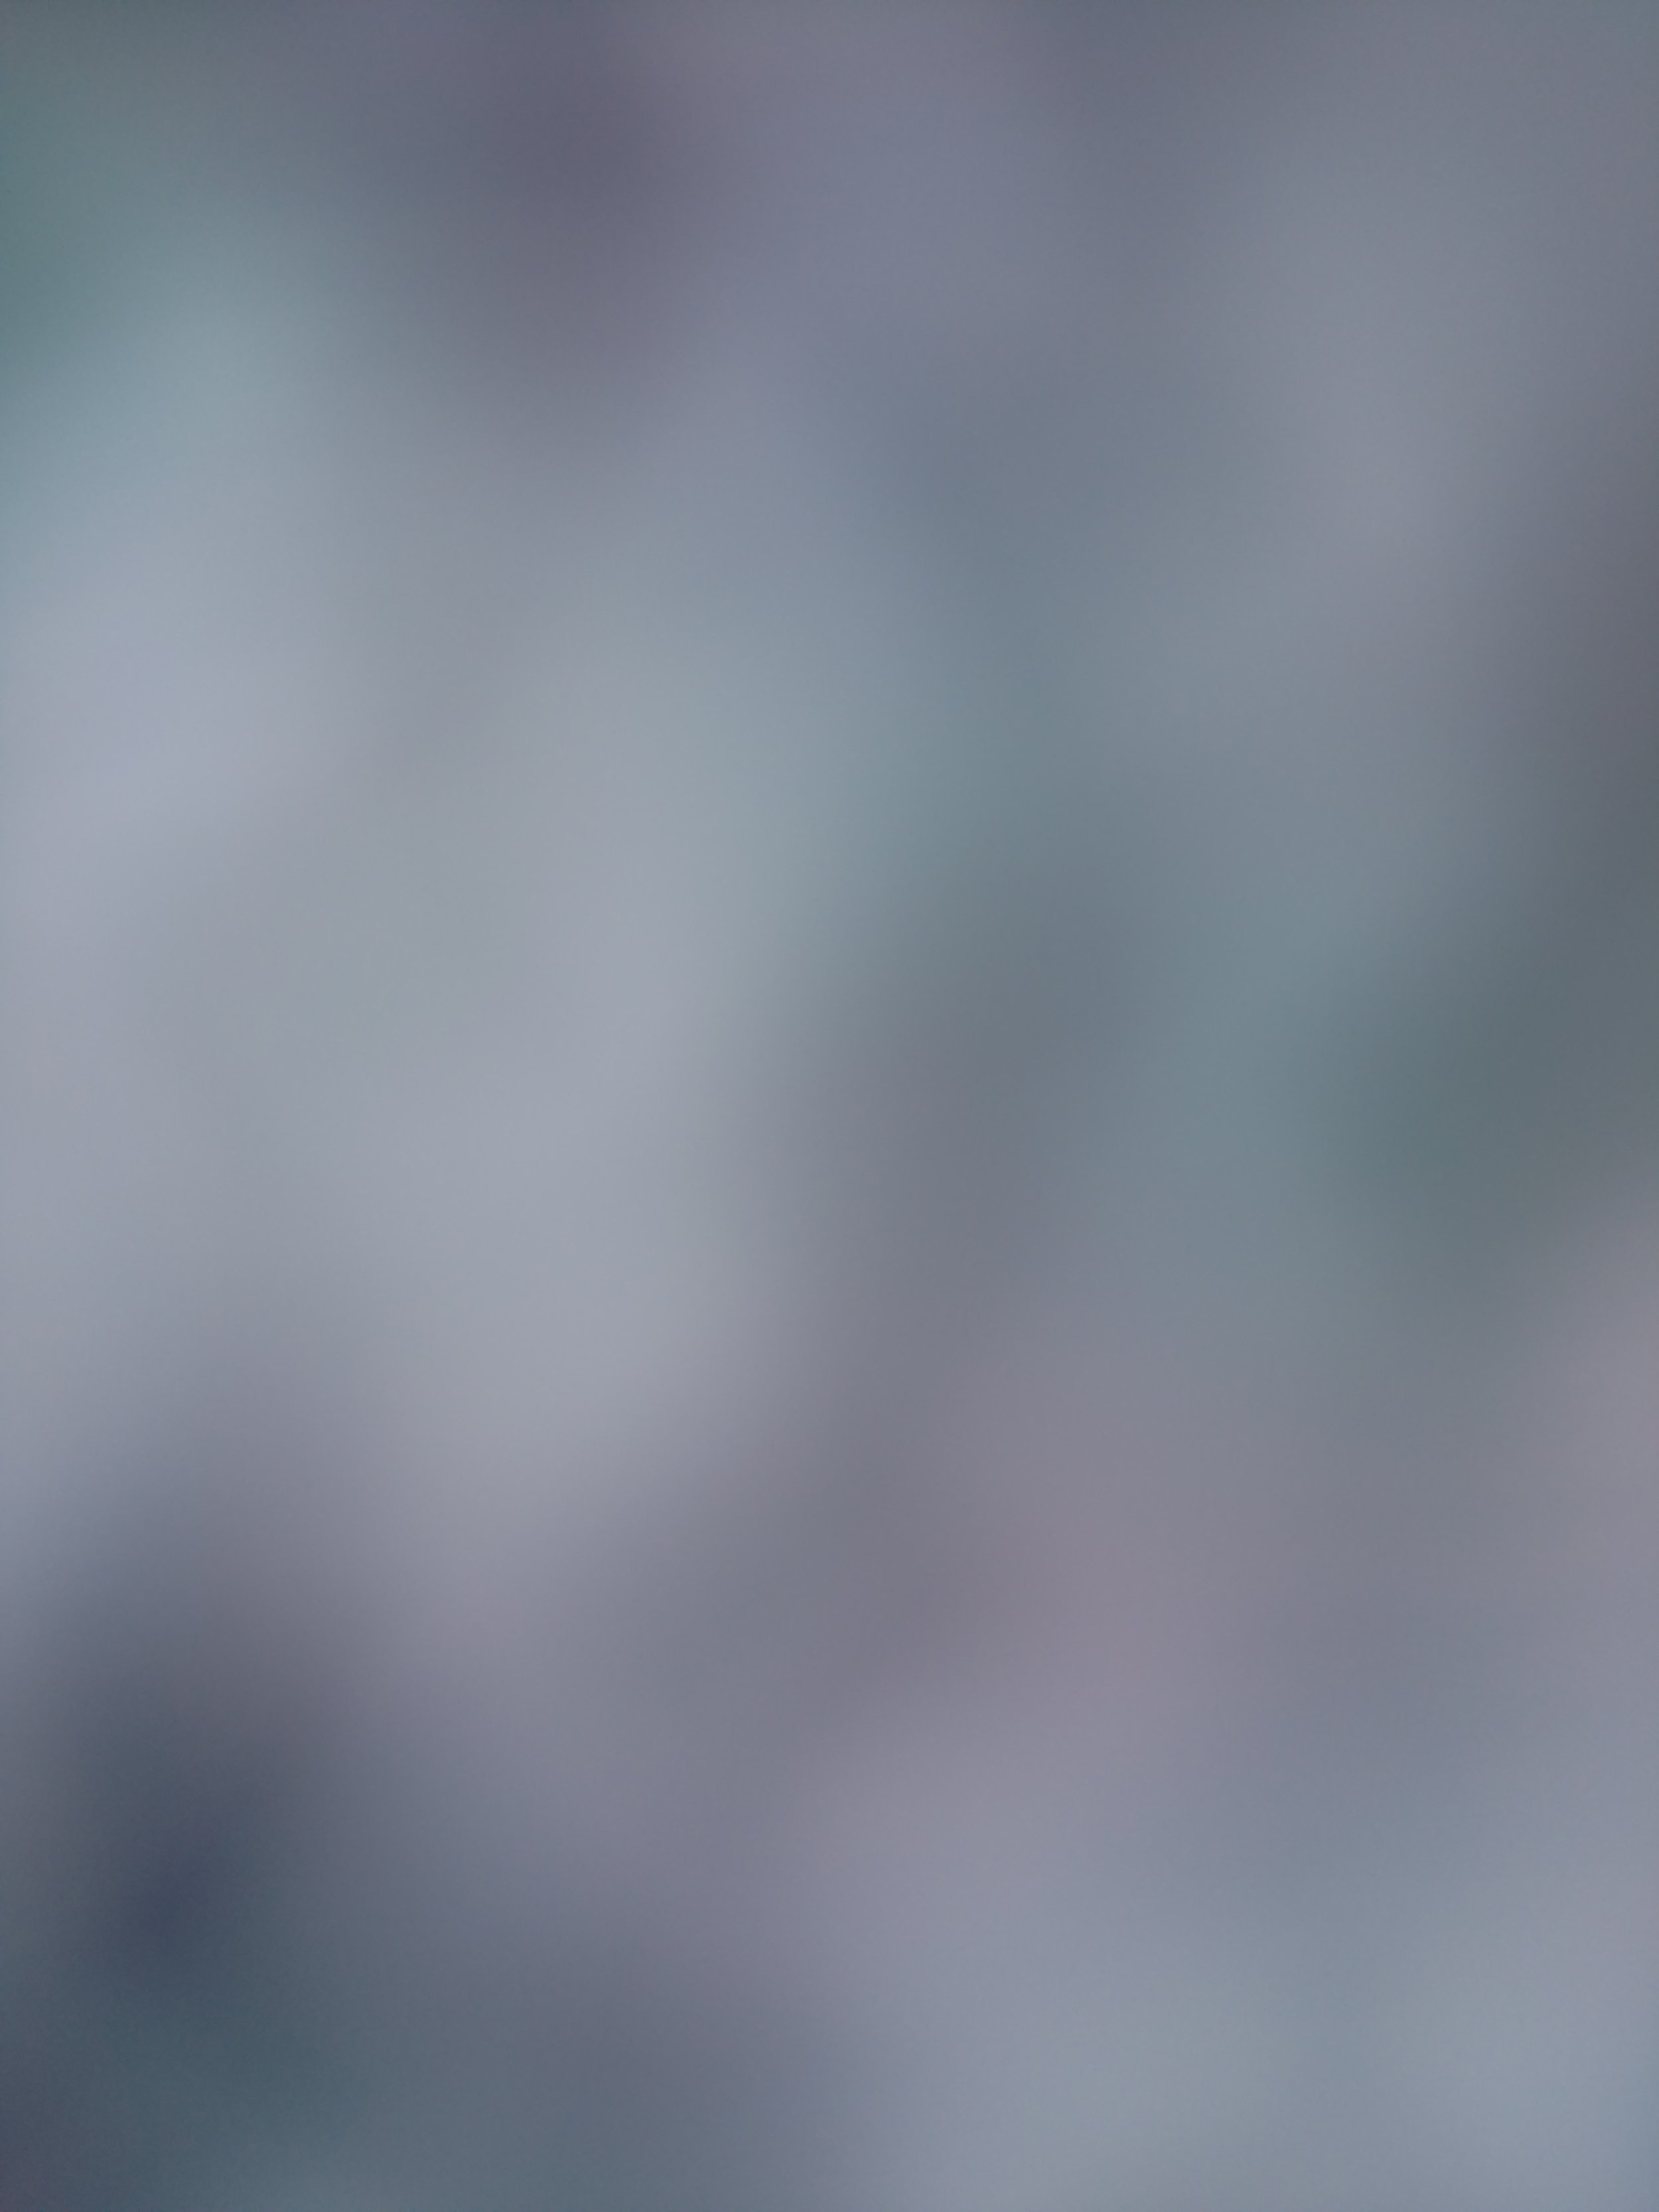 willroth-co-free-texture-gradient-002.jpg